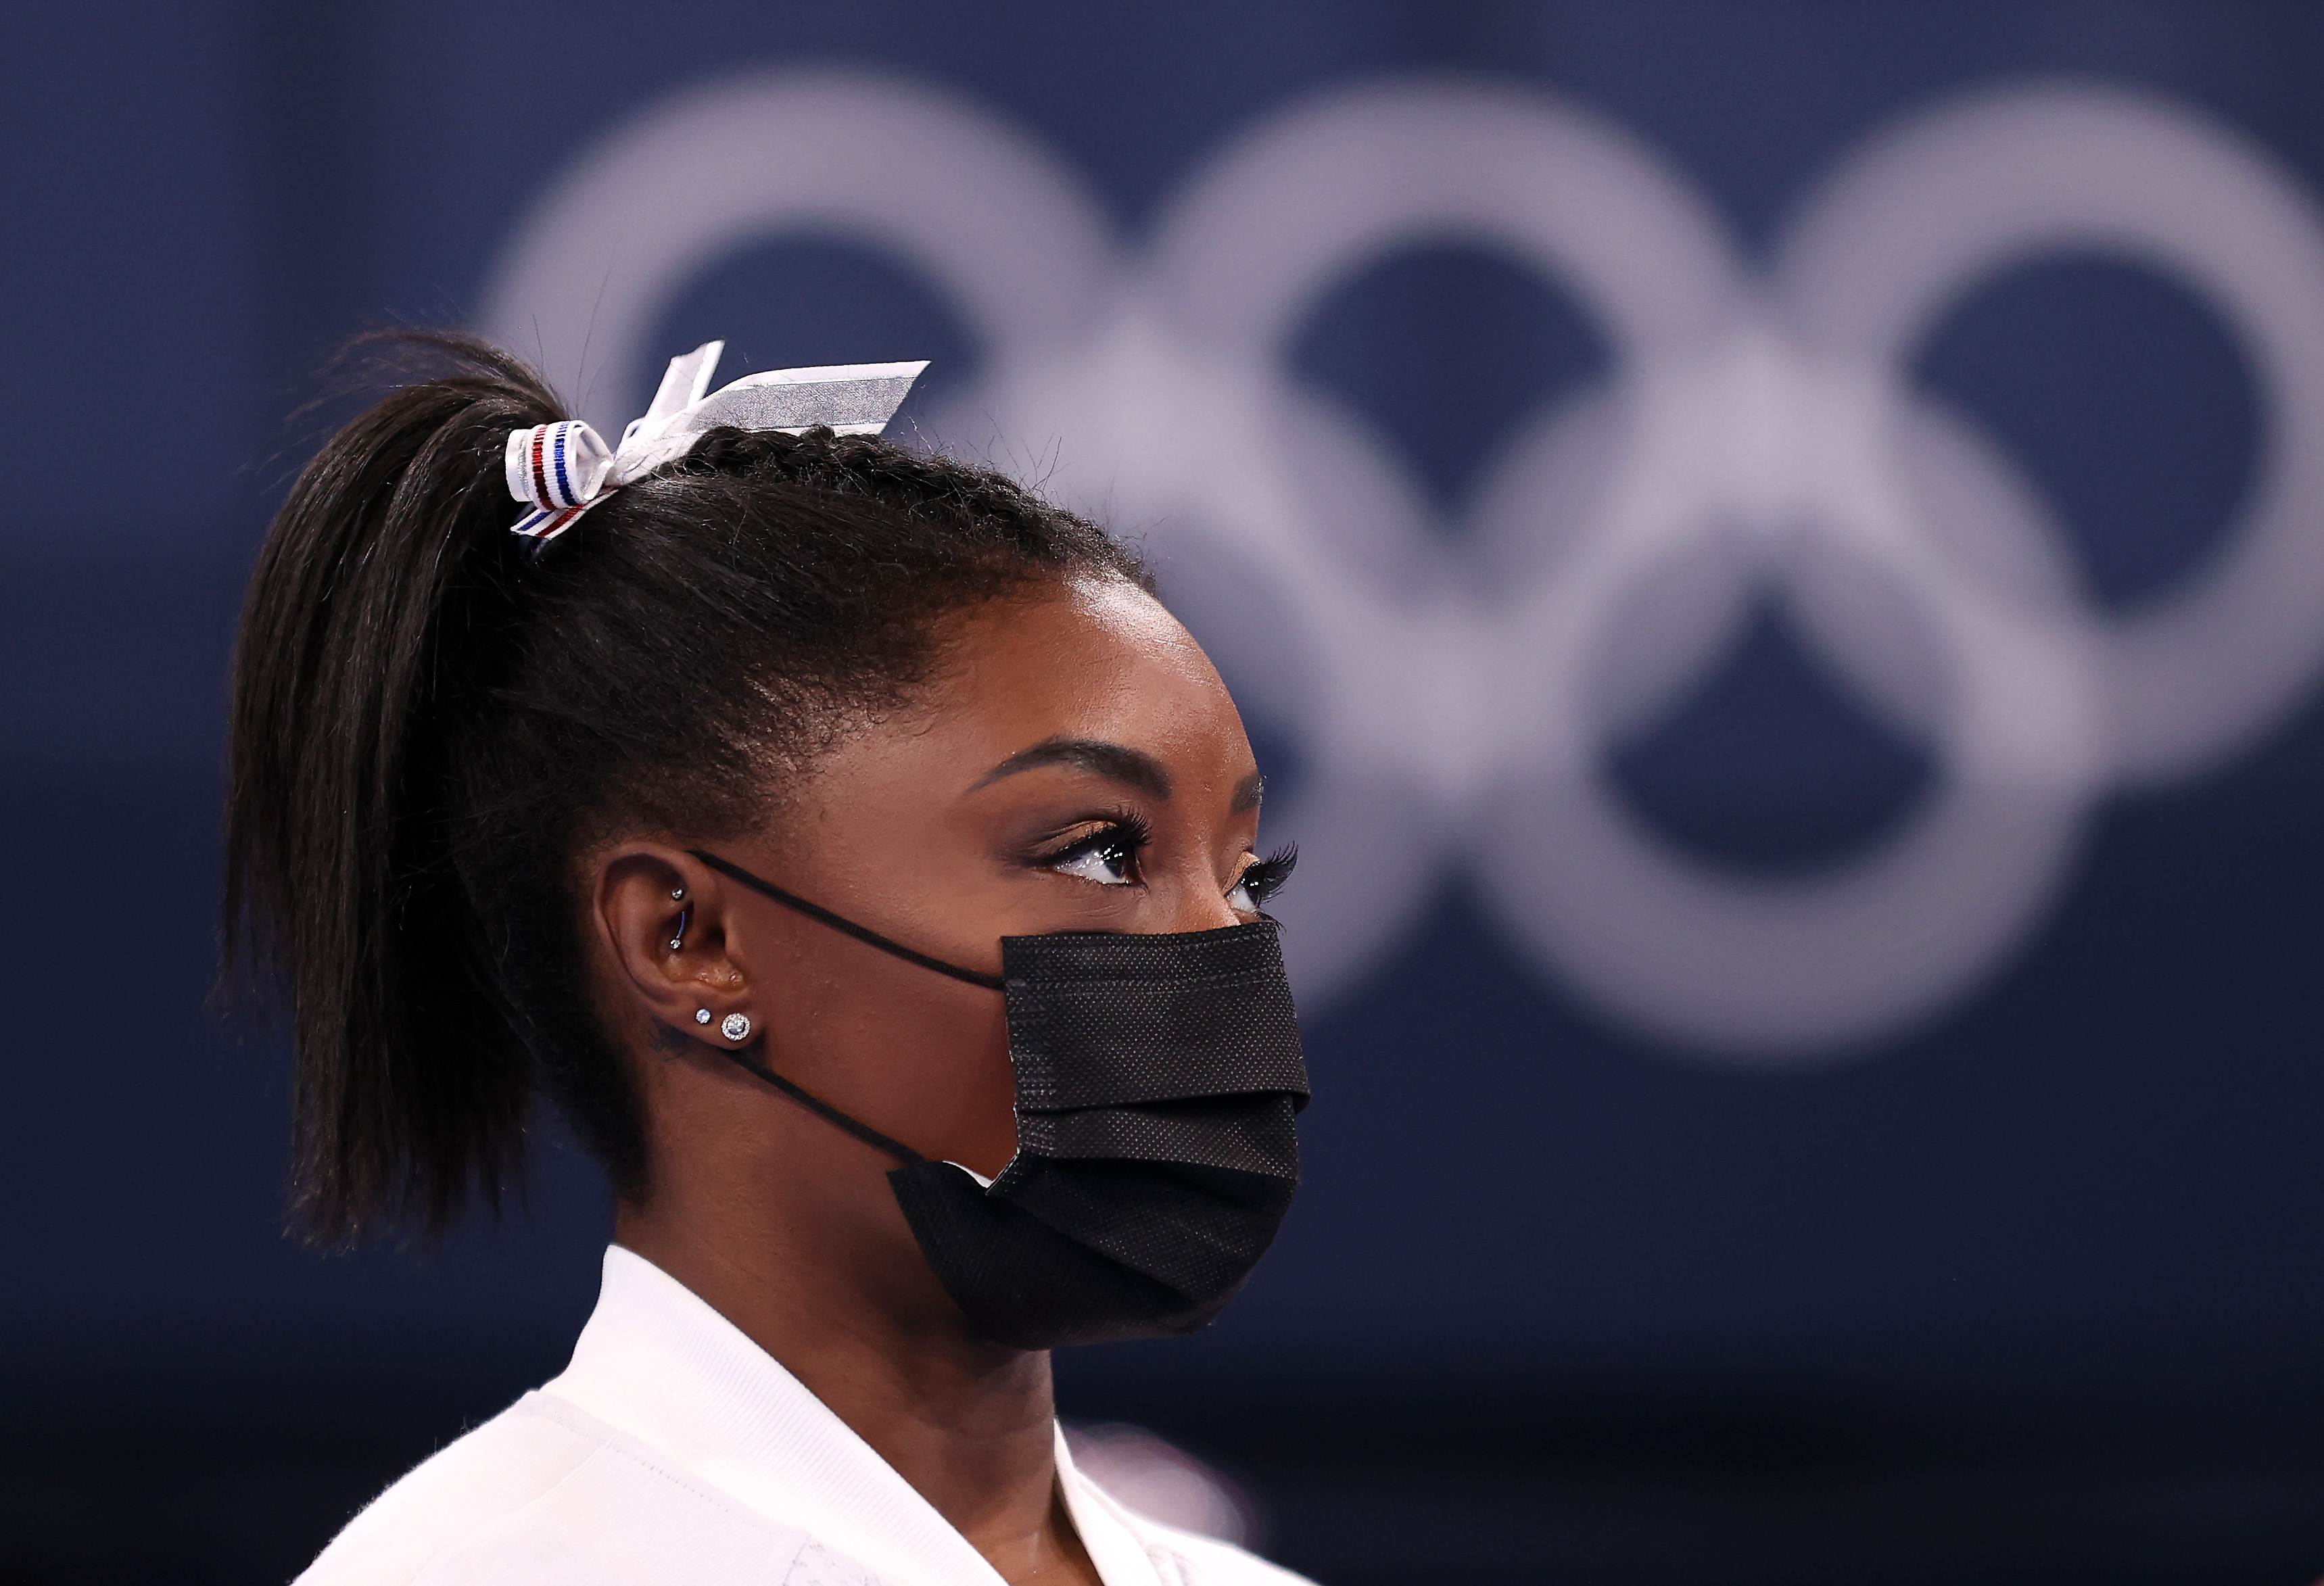 Gymnast Simone Biles, wearing a mask.